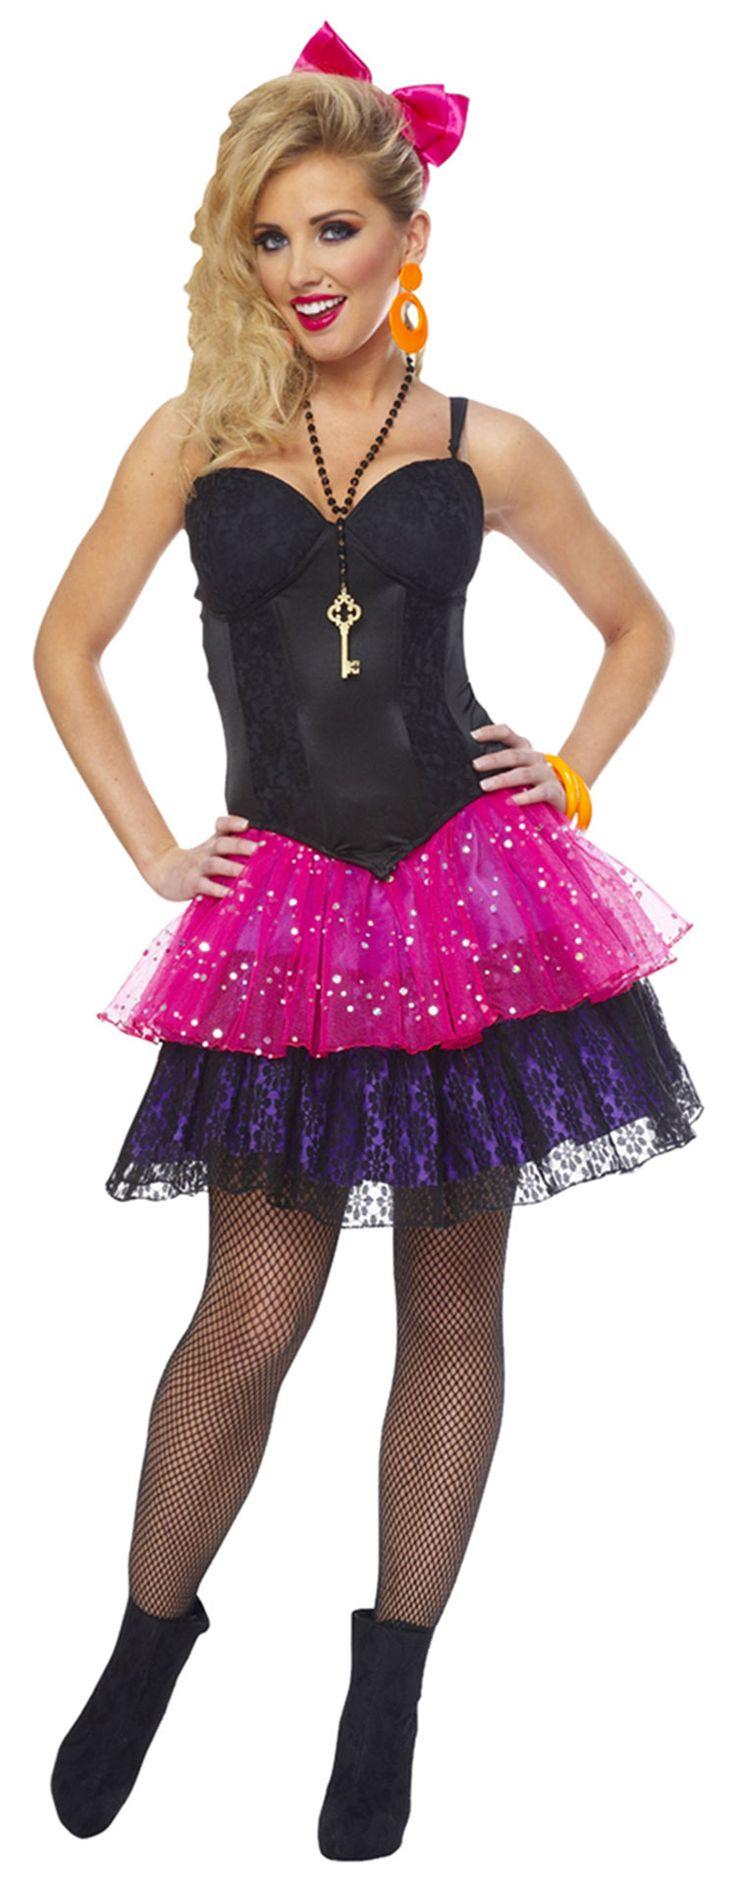 Black 80's Corset Sexy Costume - Eighties Costumes